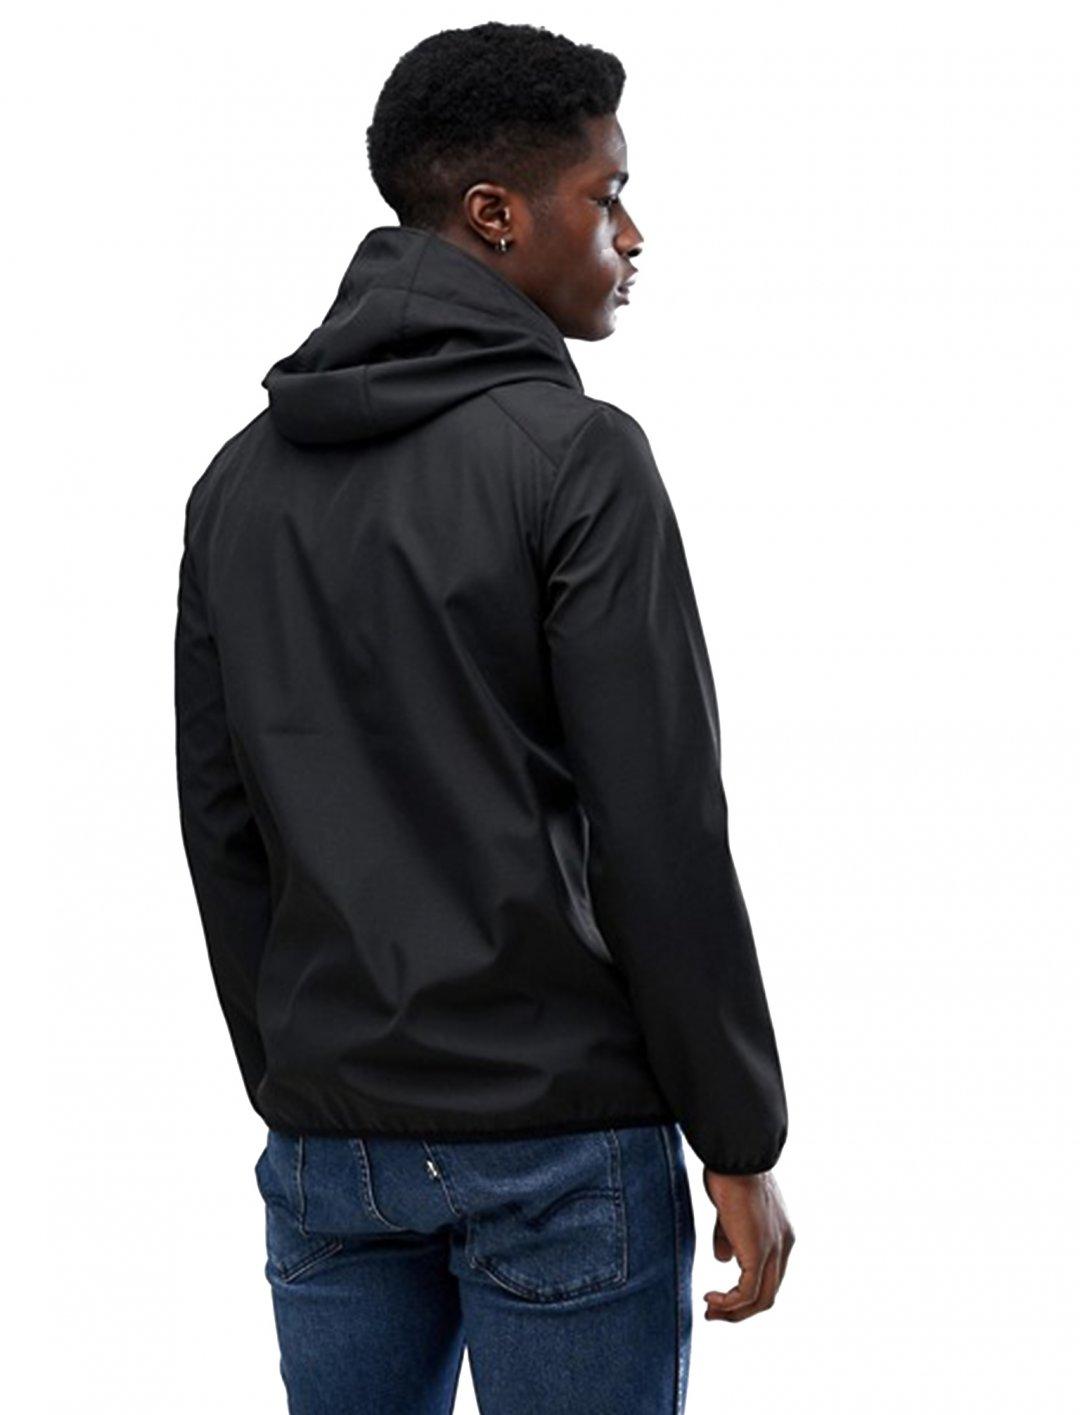 Produkt Windbreaker Clothing Produkt